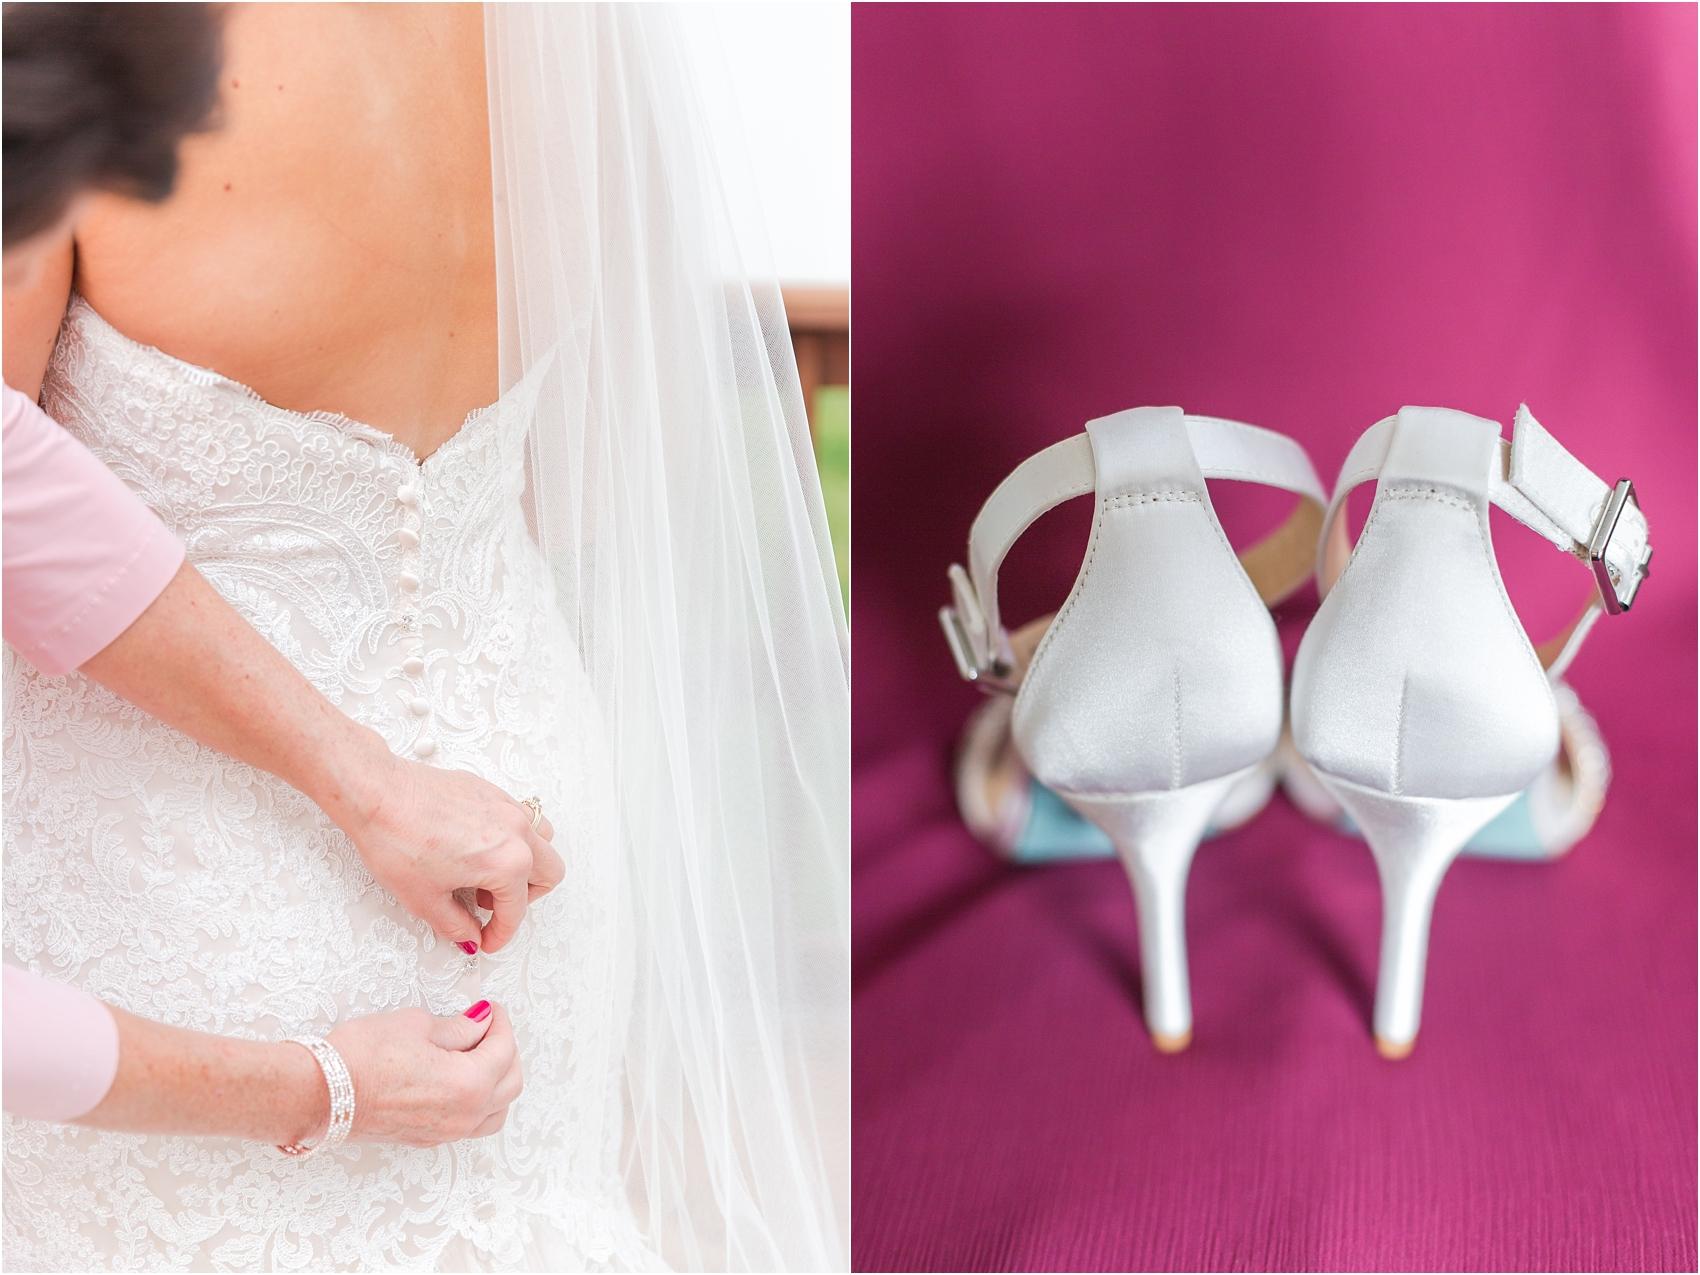 elegant-and-romantic-fall-wedding-photos-at-st-marys-catholic-church-in-monroe-michigan-by-courtney-carolyn-photography_0007.jpg